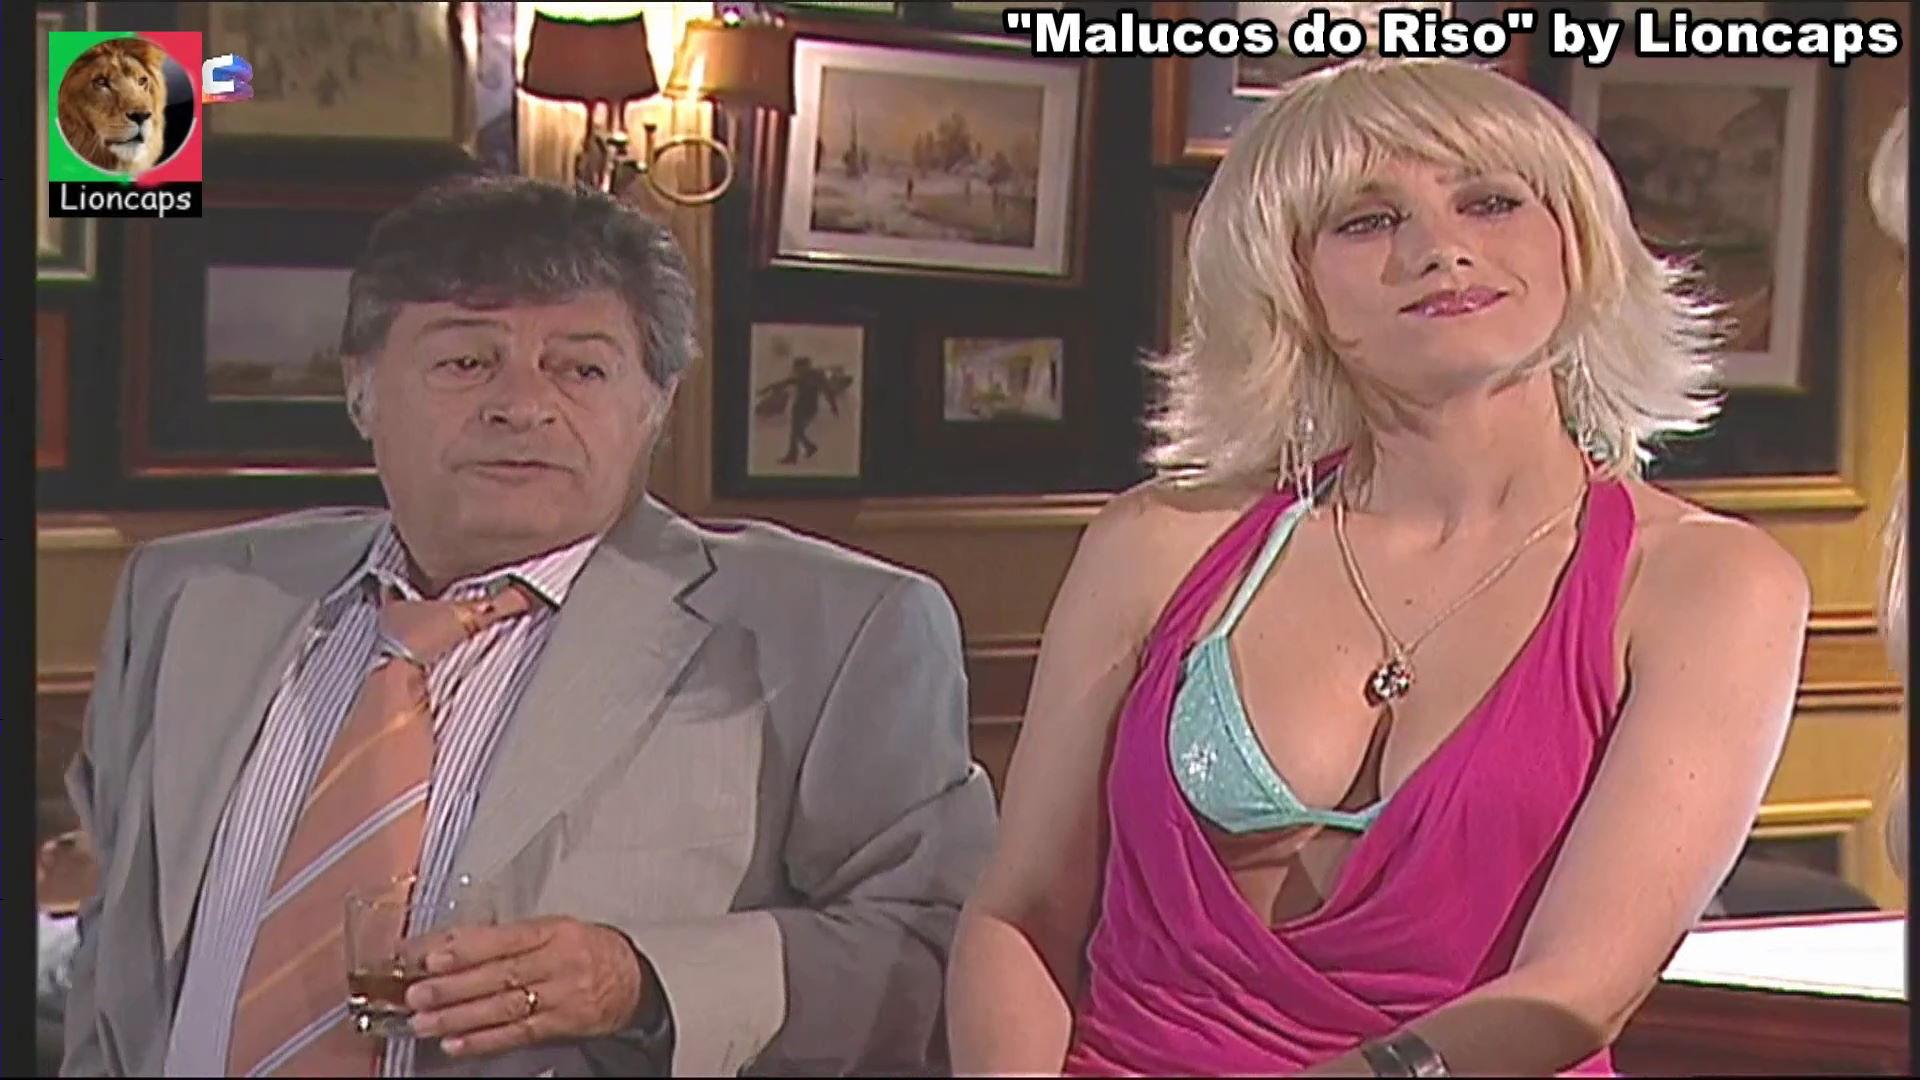 475058742_malucos_riso_alda_gomes_vs190malucos_riso_602_1504_122_29lo.JPG